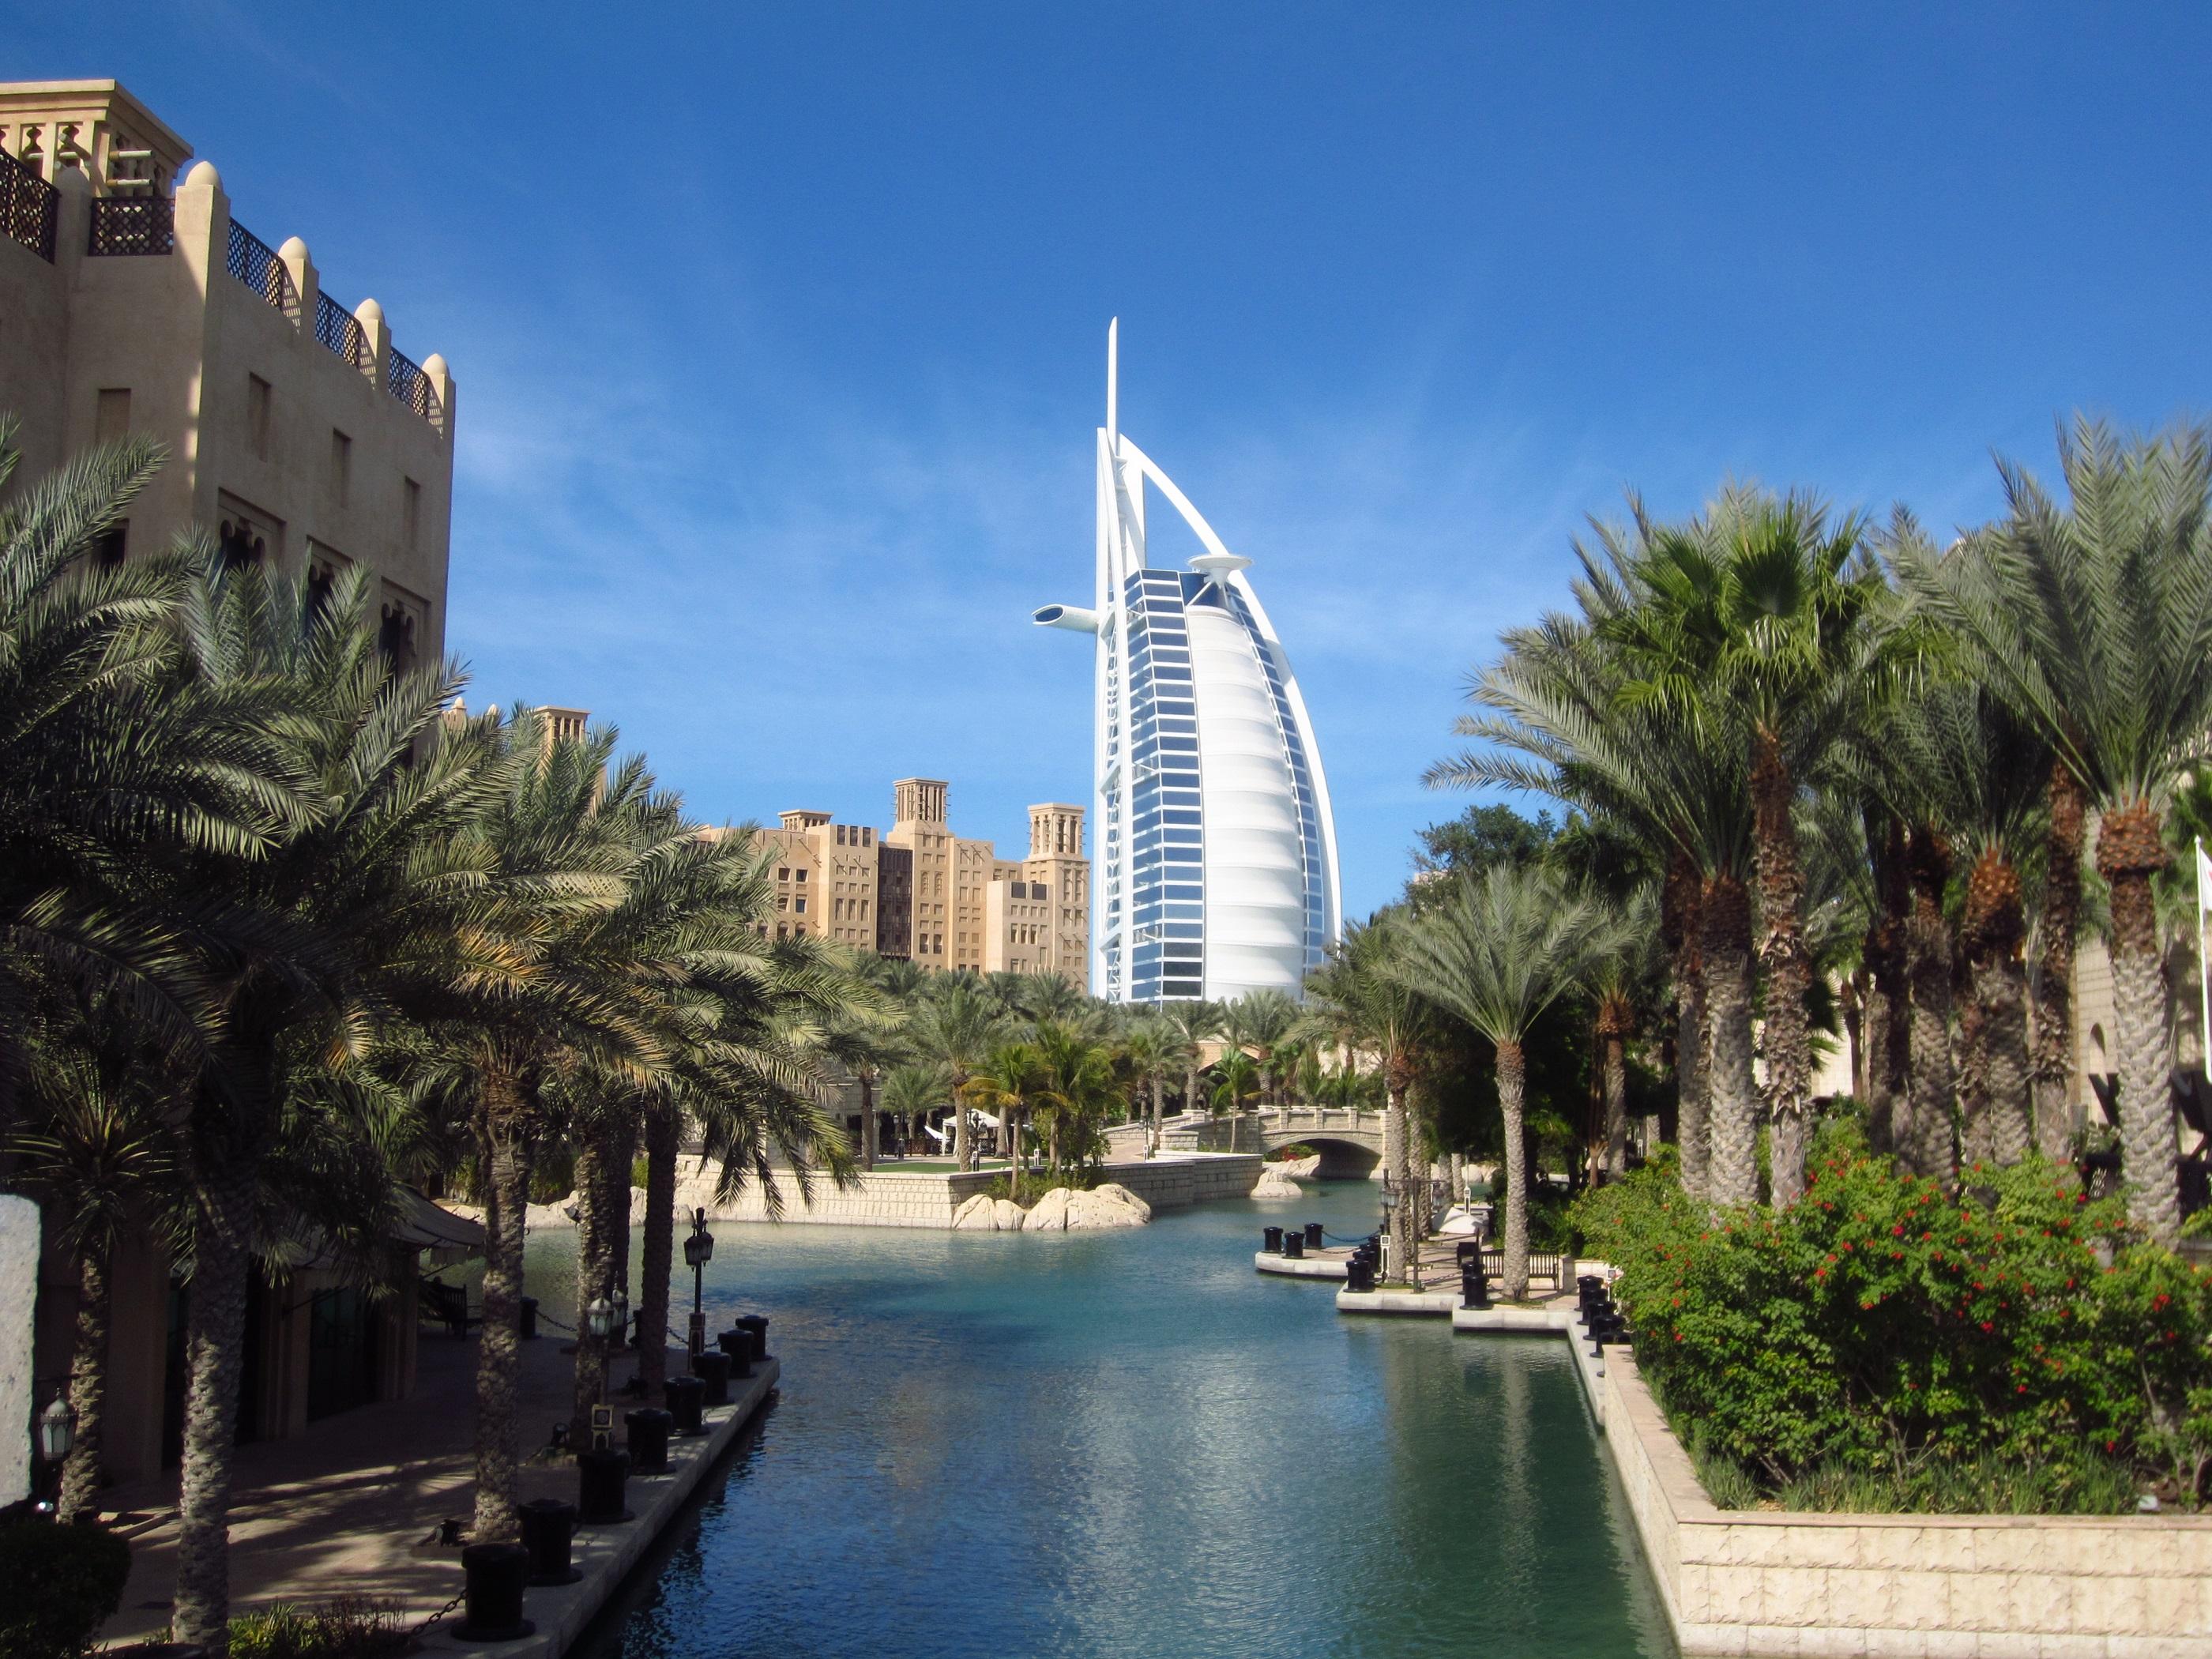 Blick auf das Burj Al Arab